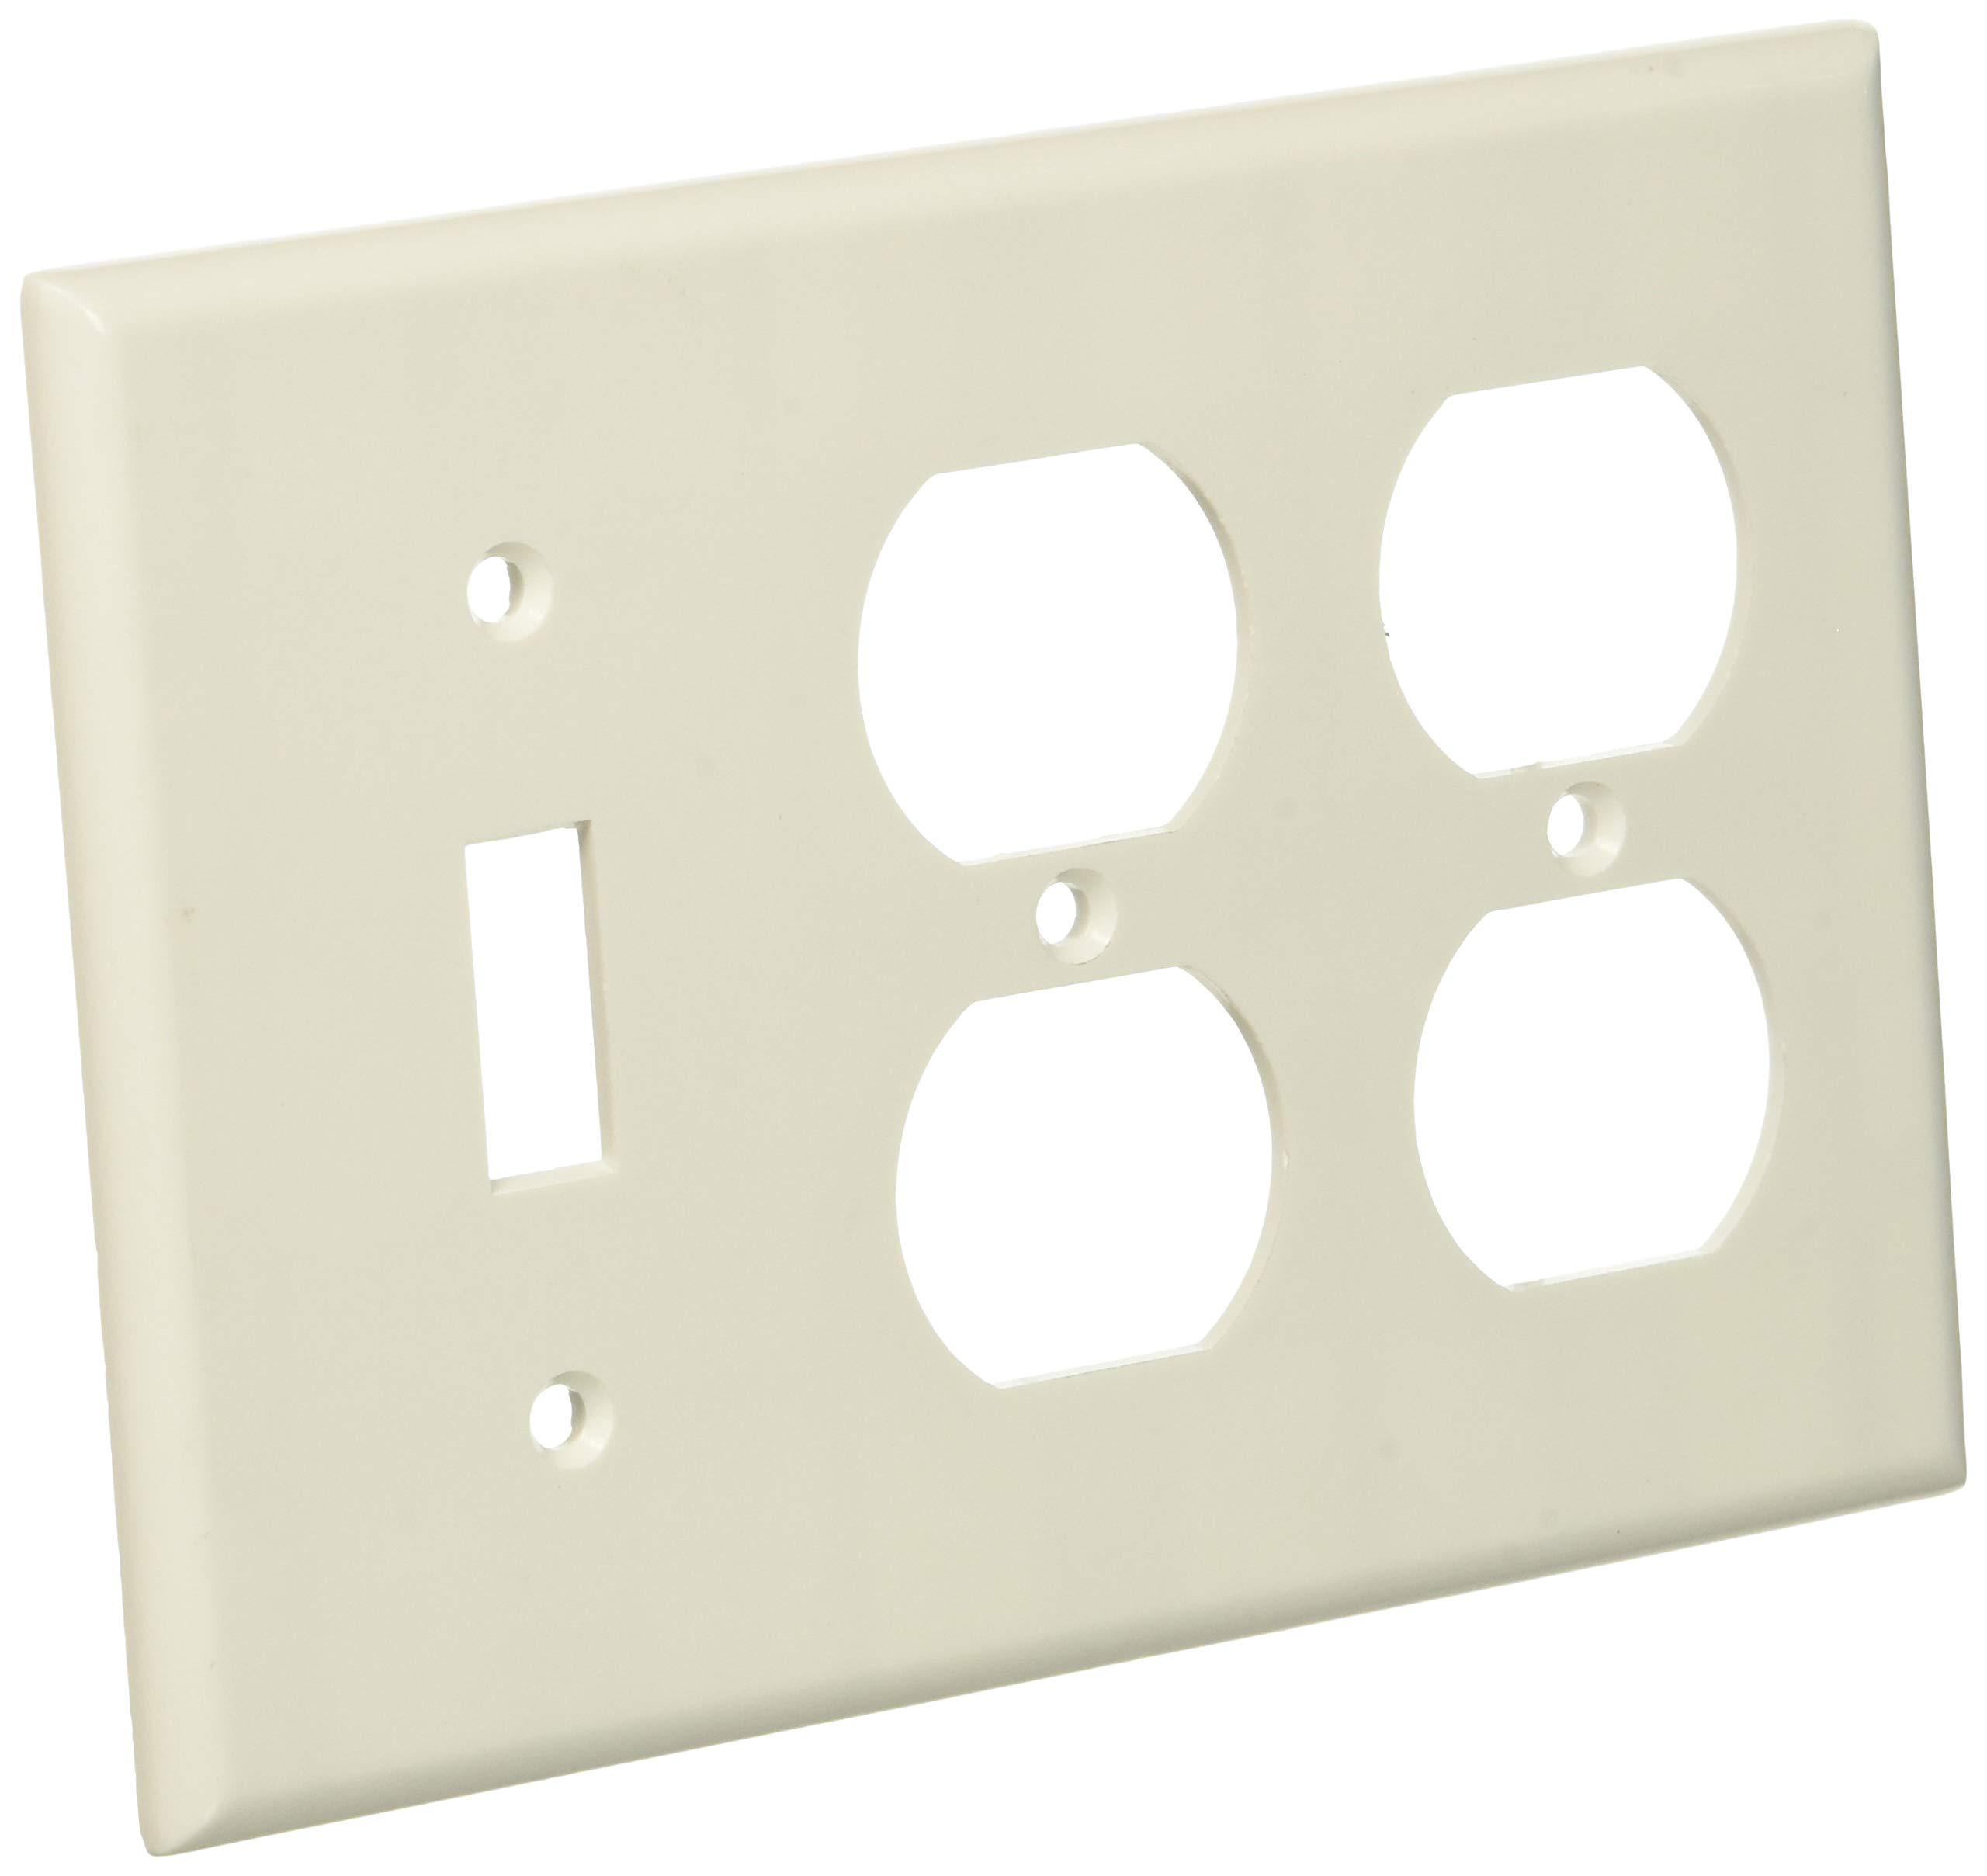 Leviton 88047.0 3-Gang 1-Toggle 2-Duplex Device Combo Wallplate, White, 10 Piece